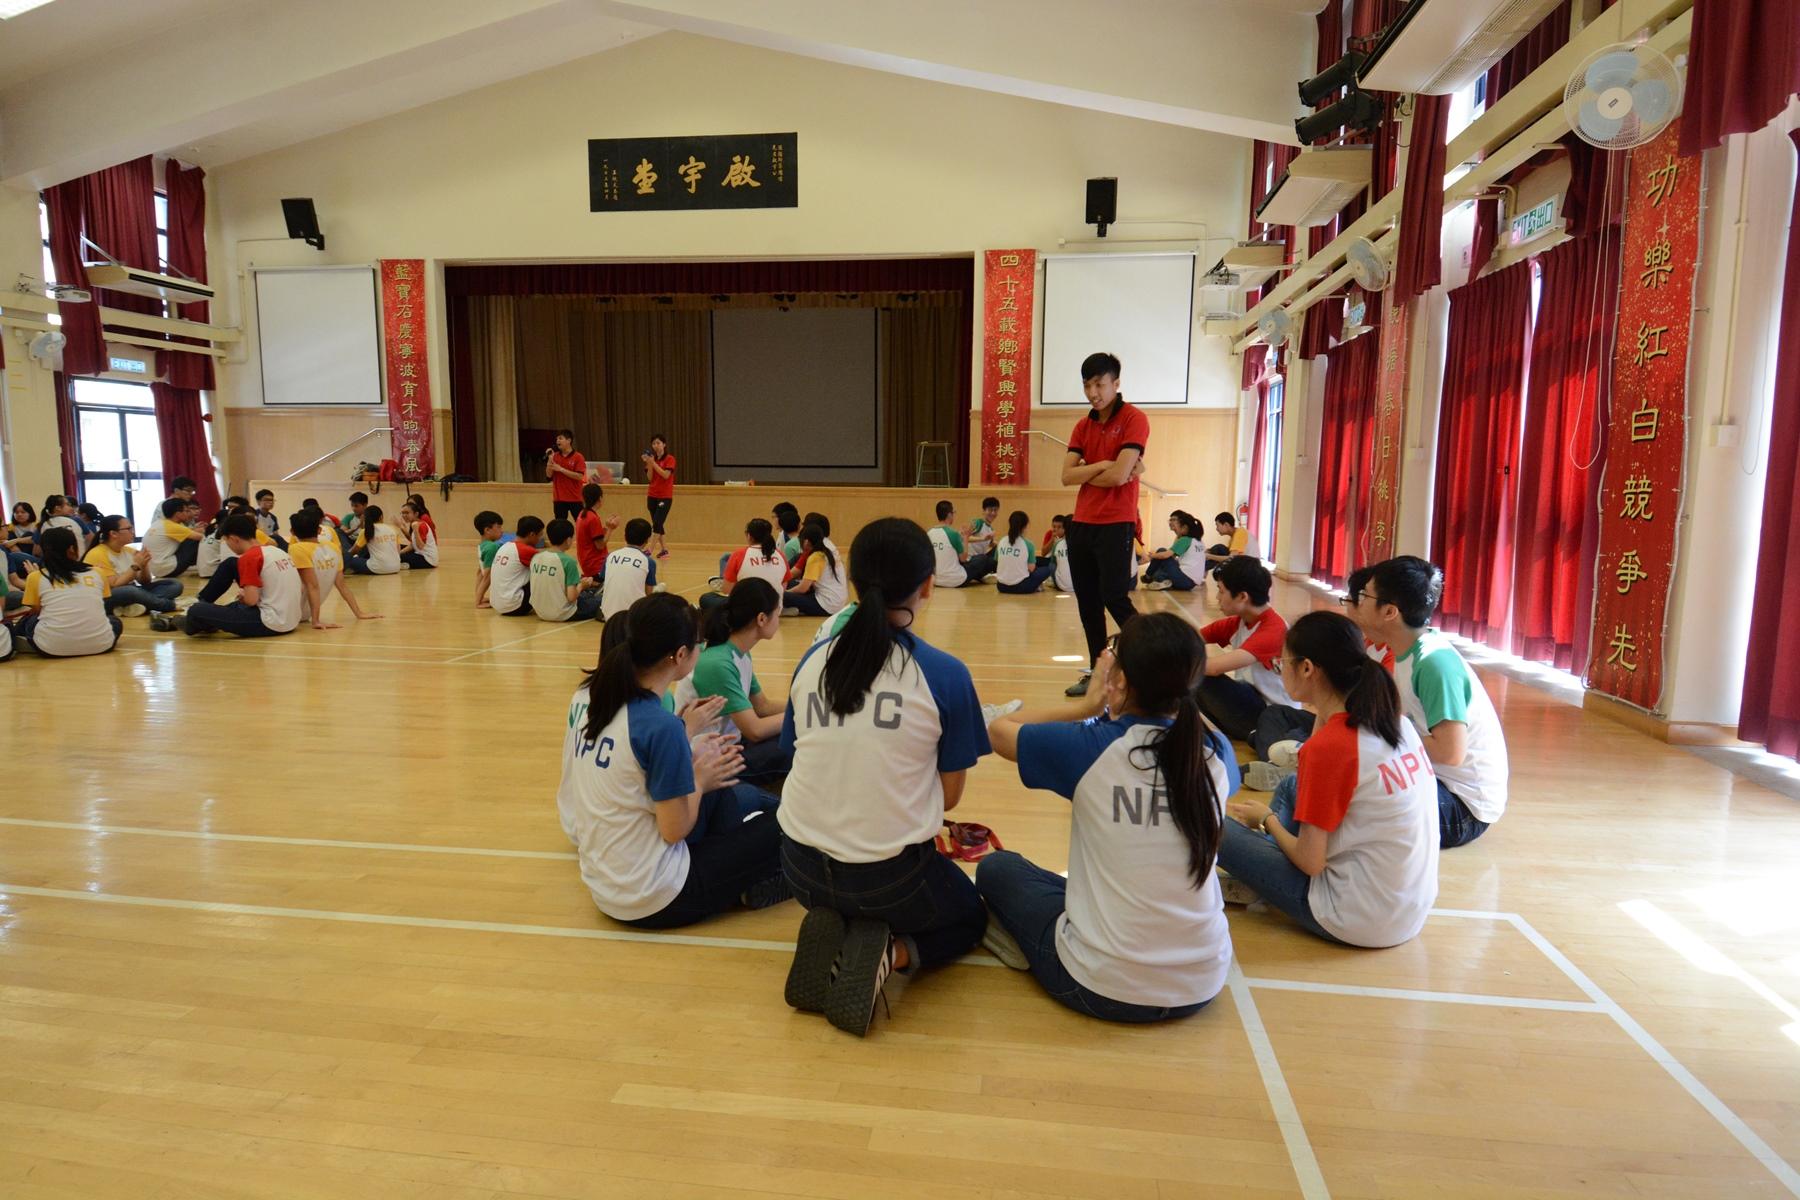 http://npc.edu.hk/sites/default/files/dsc_2952.jpg